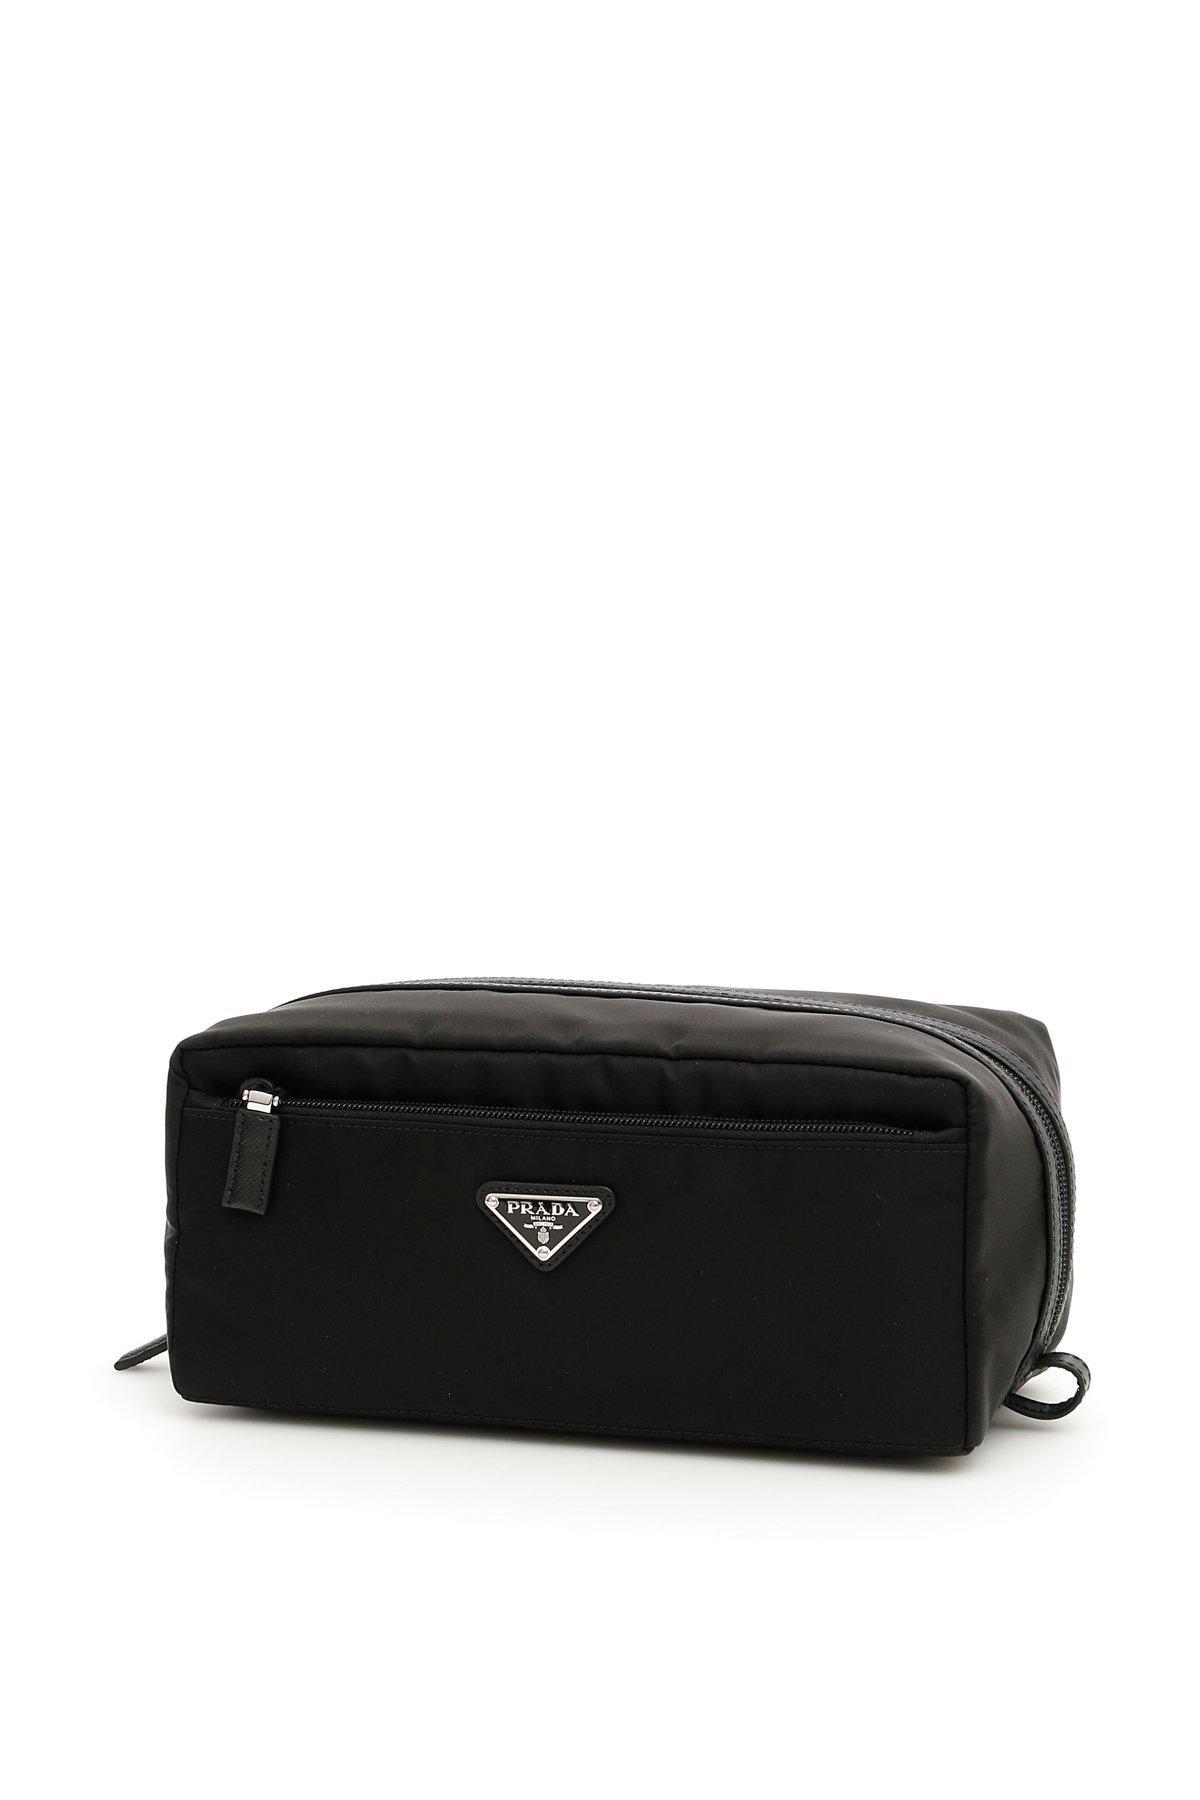 5a402b764b1f2a Prada - Black Logo Toiletry Bag for Men - Lyst. View fullscreen